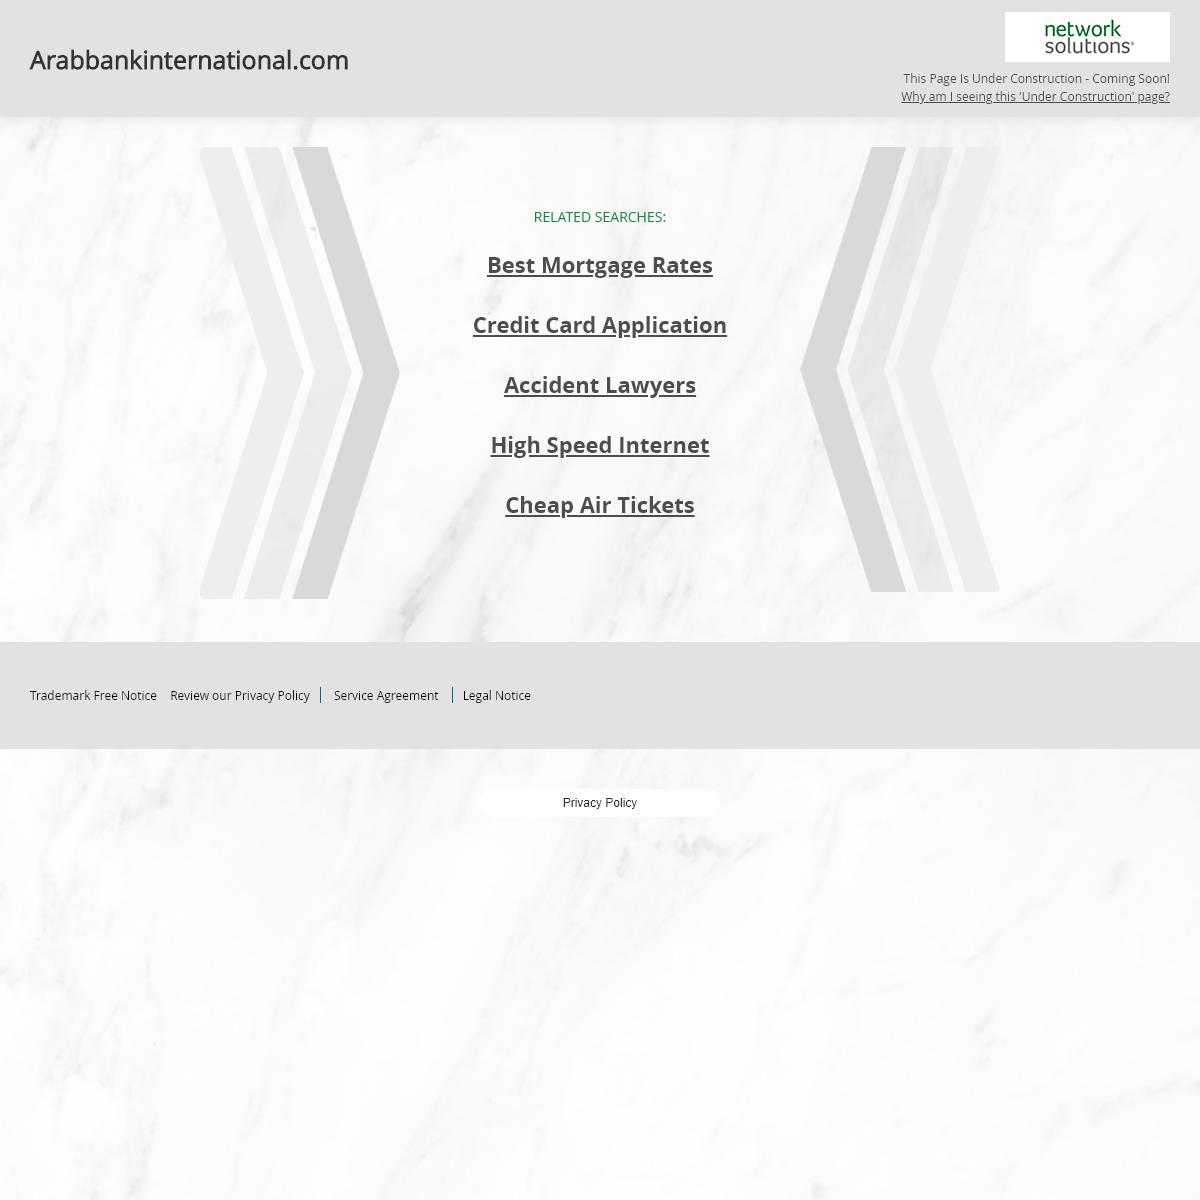 Arabbankinternational.com